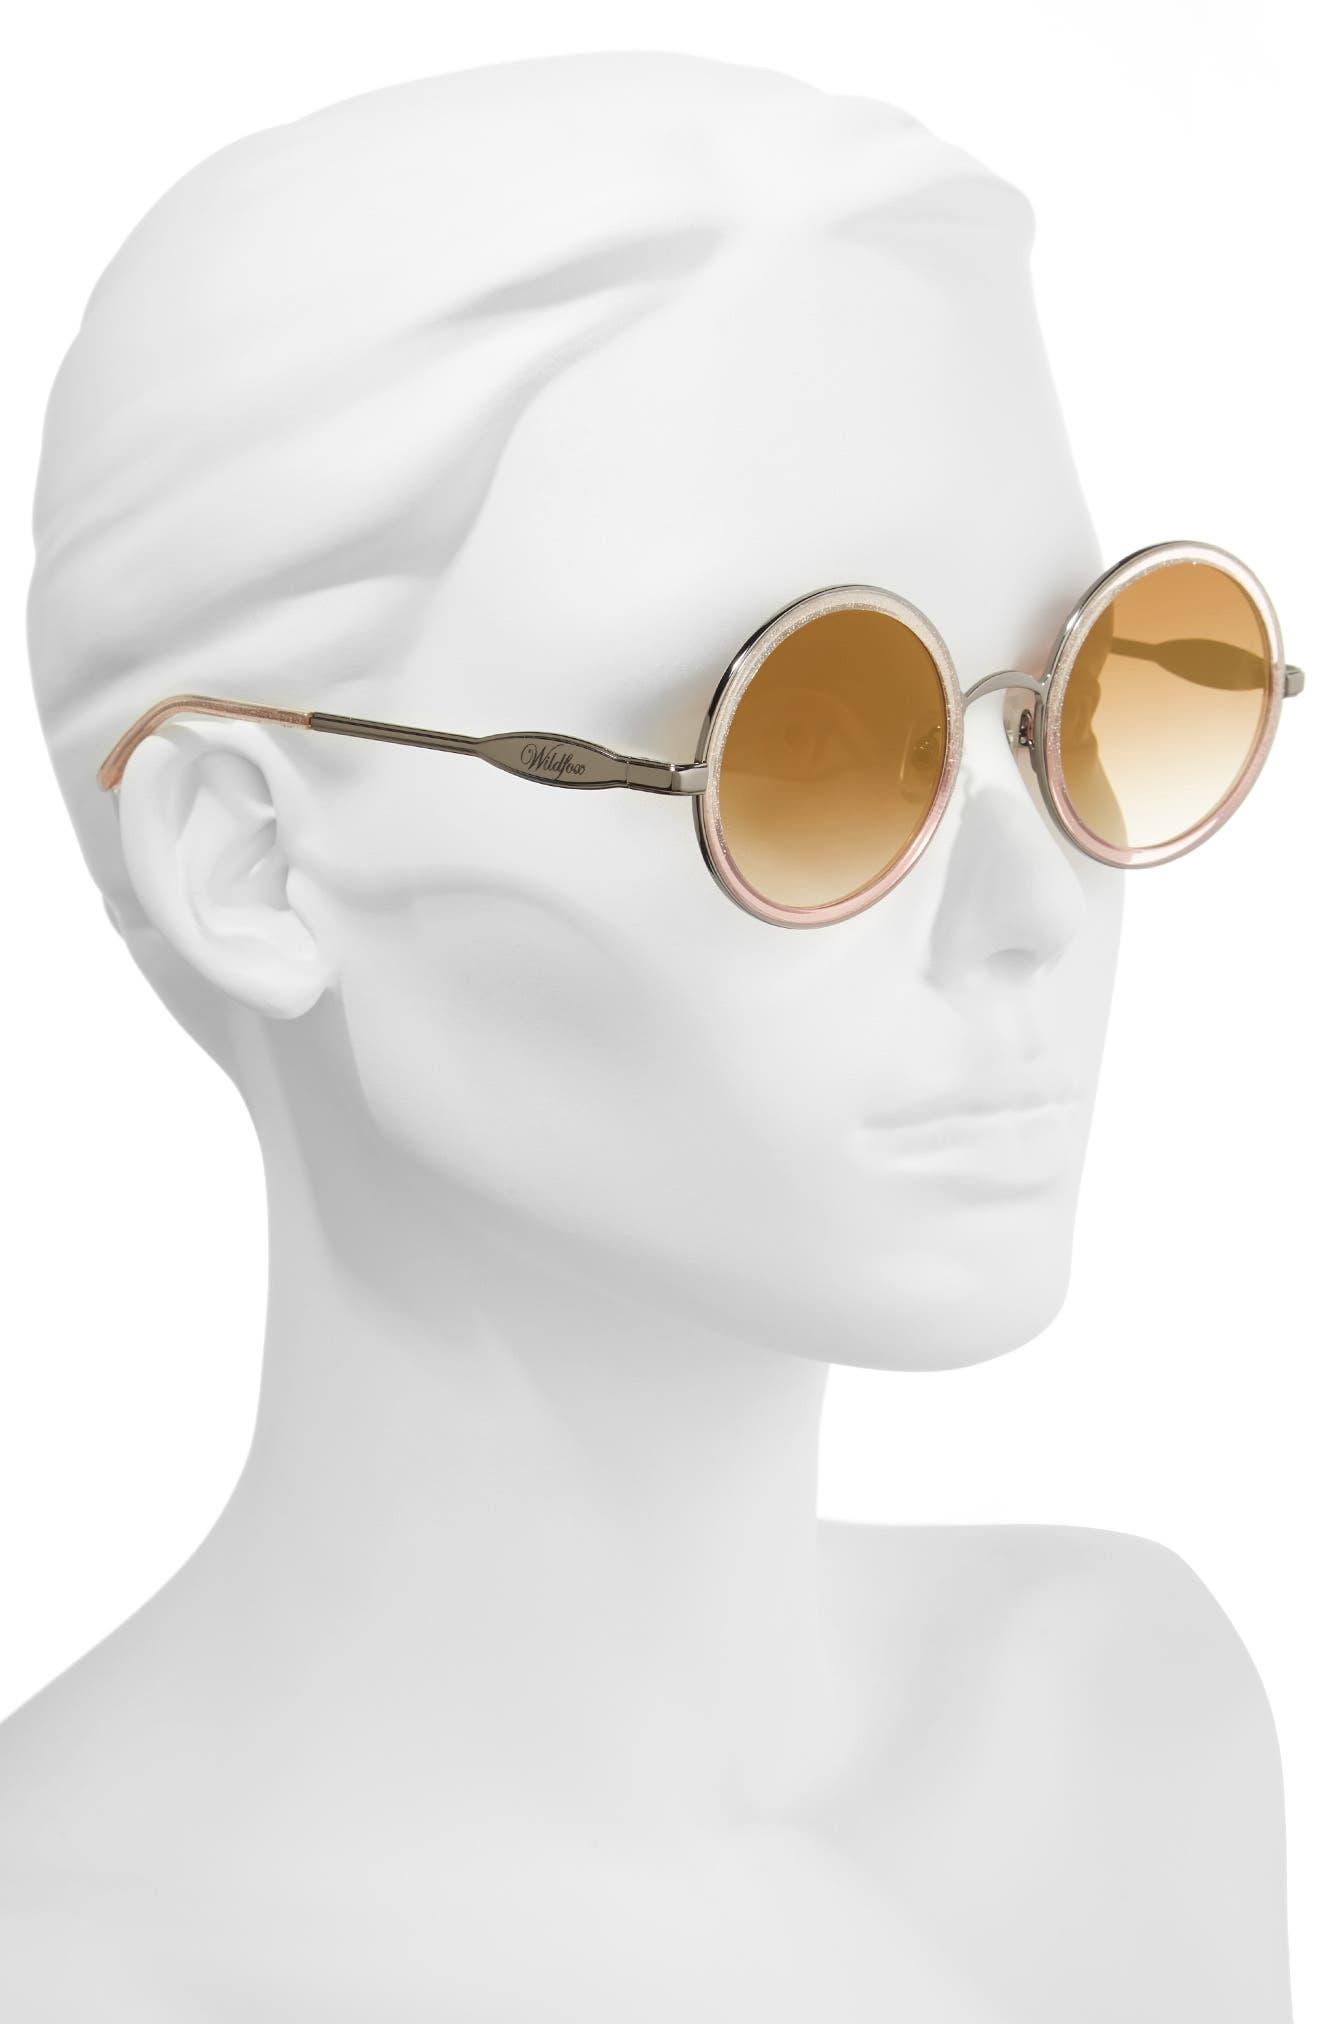 Ryder Zero 49mm Flat Round Sunglasses,                             Alternate thumbnail 2, color,                             GLITZ